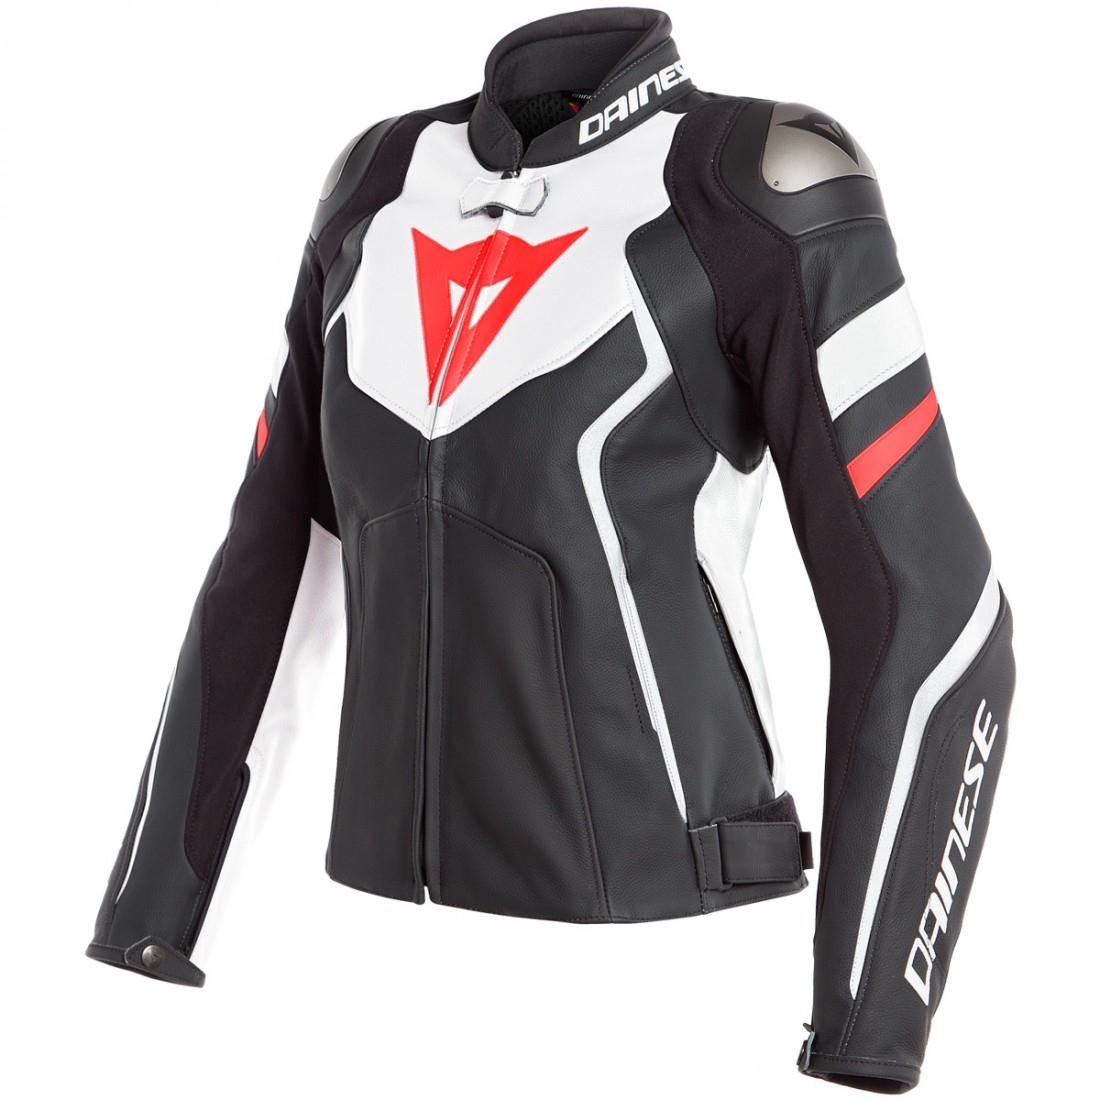 Moto Dainese Chaqueta Talla Mujer S jzpMSLqVGU